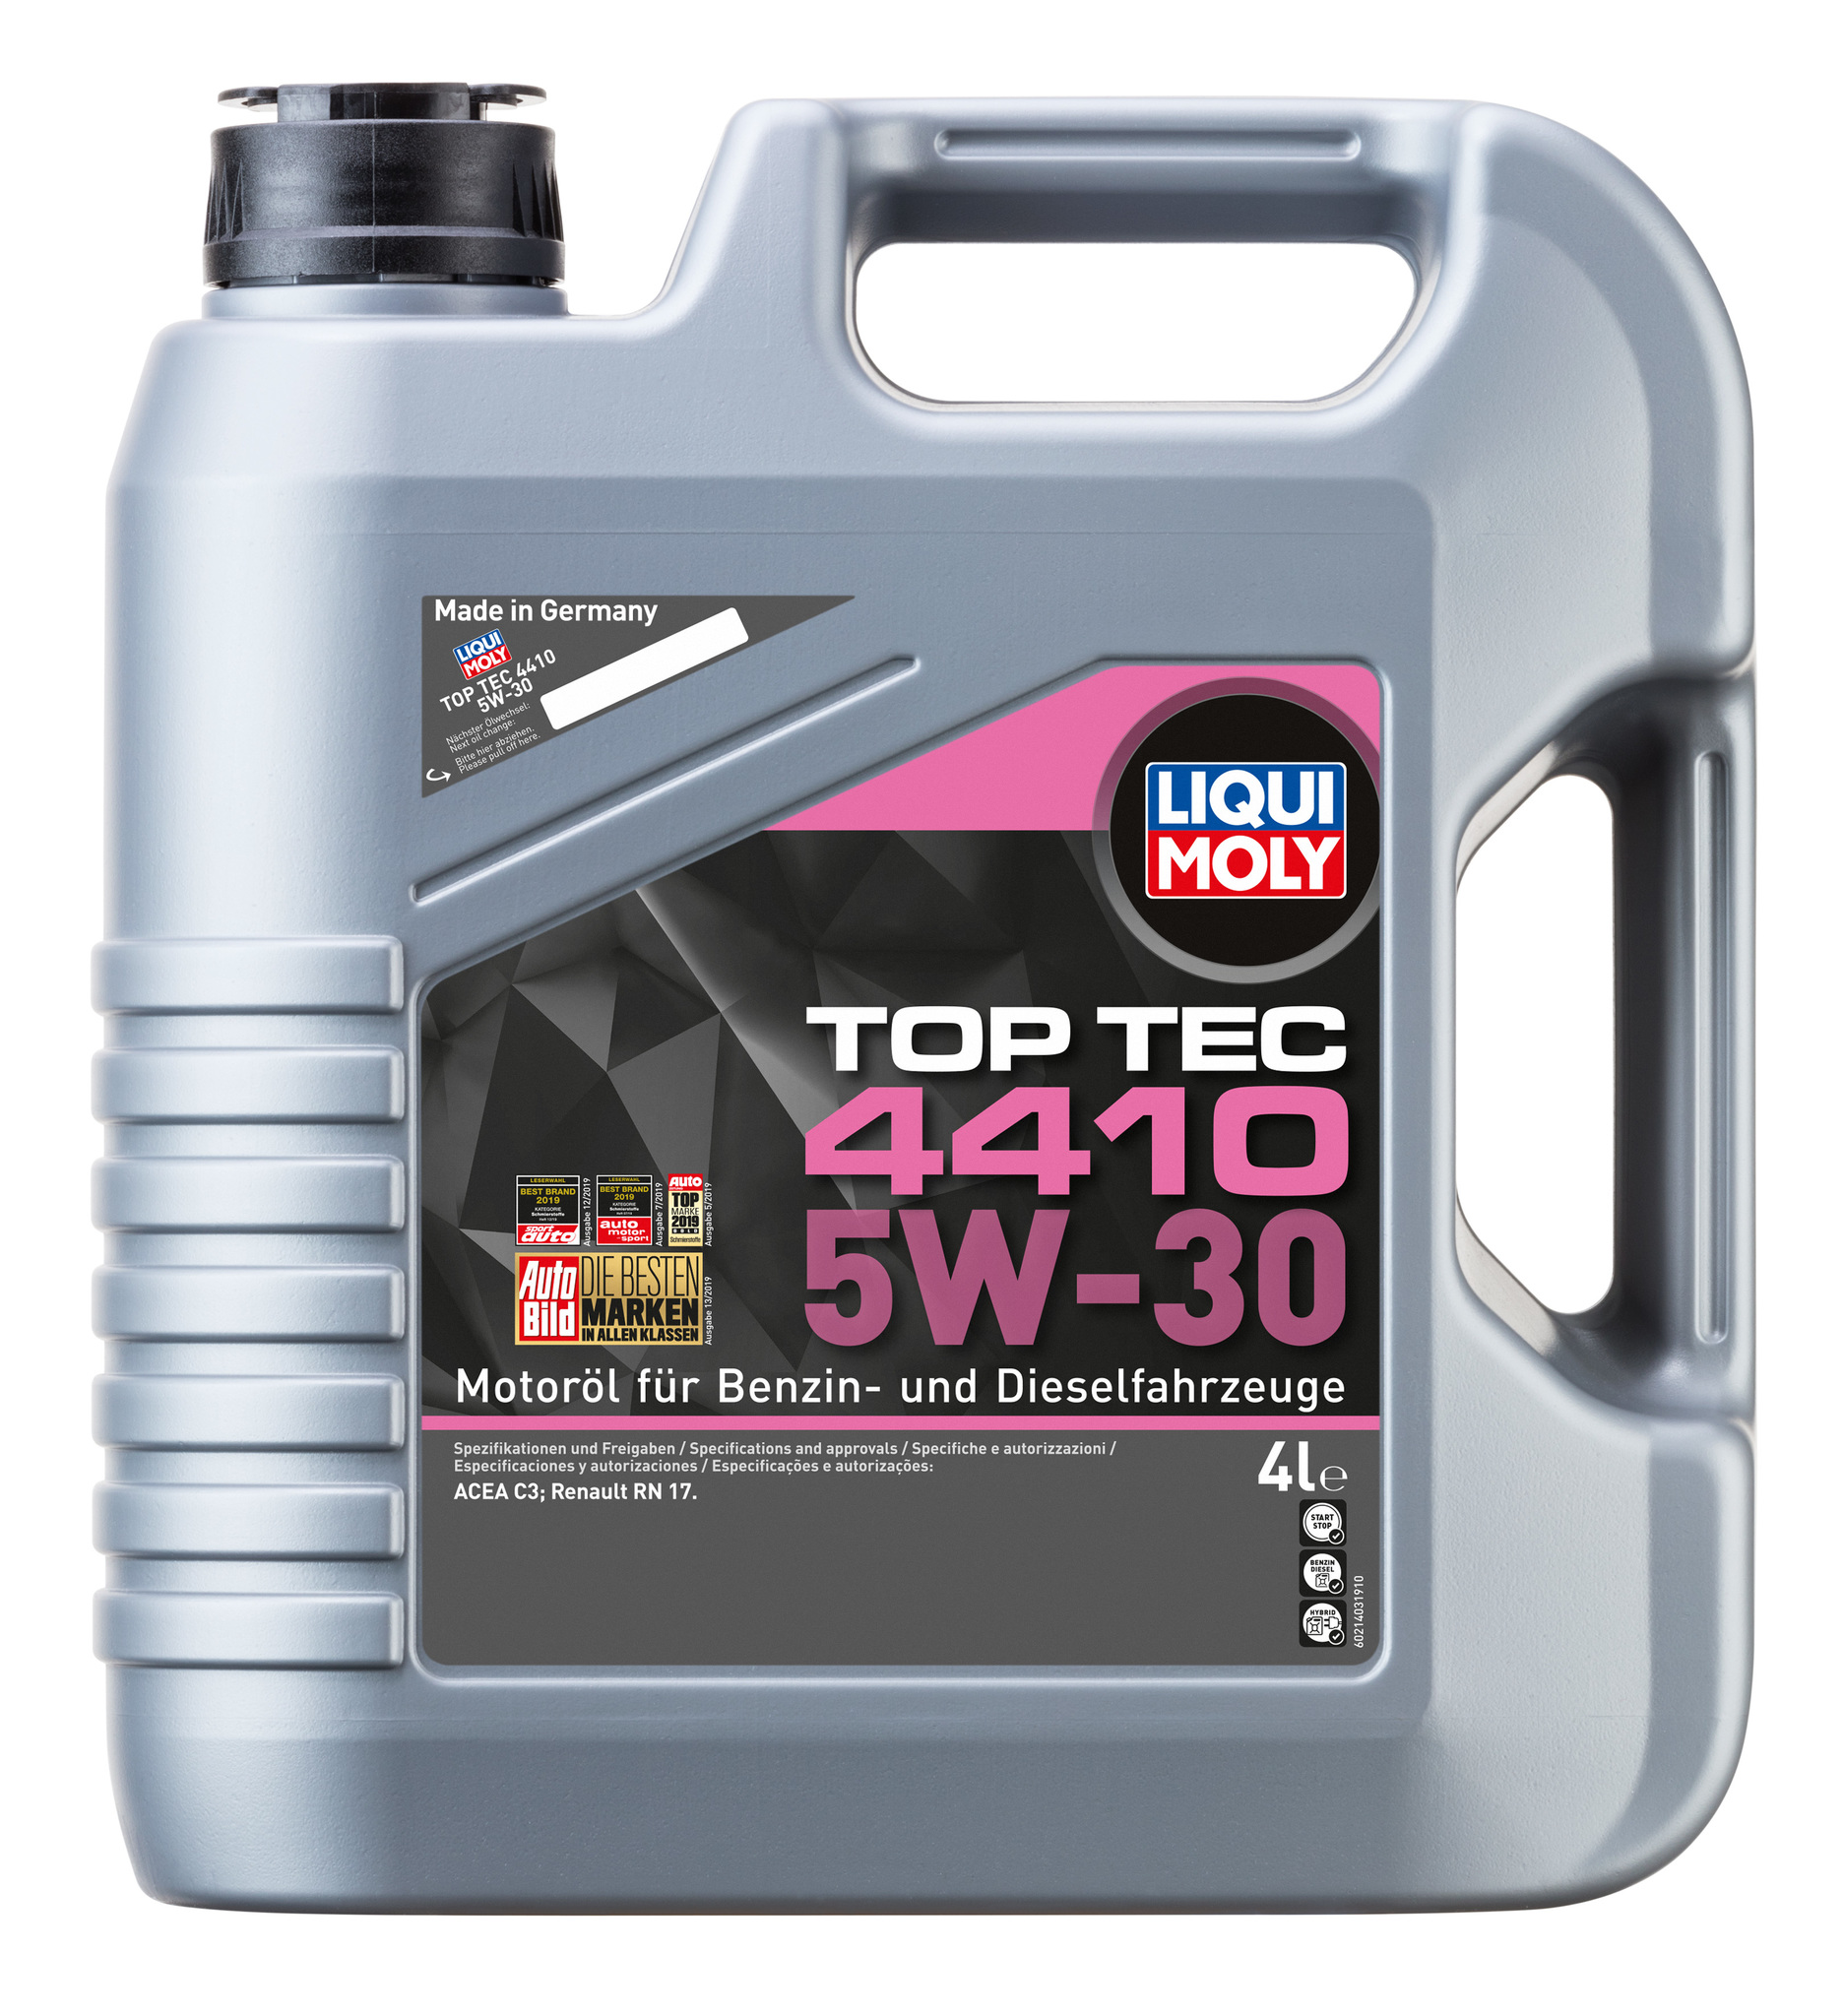 Liqui Moly Top Tec 4410 5W30  НС-синтетическое моторное масло для Рено